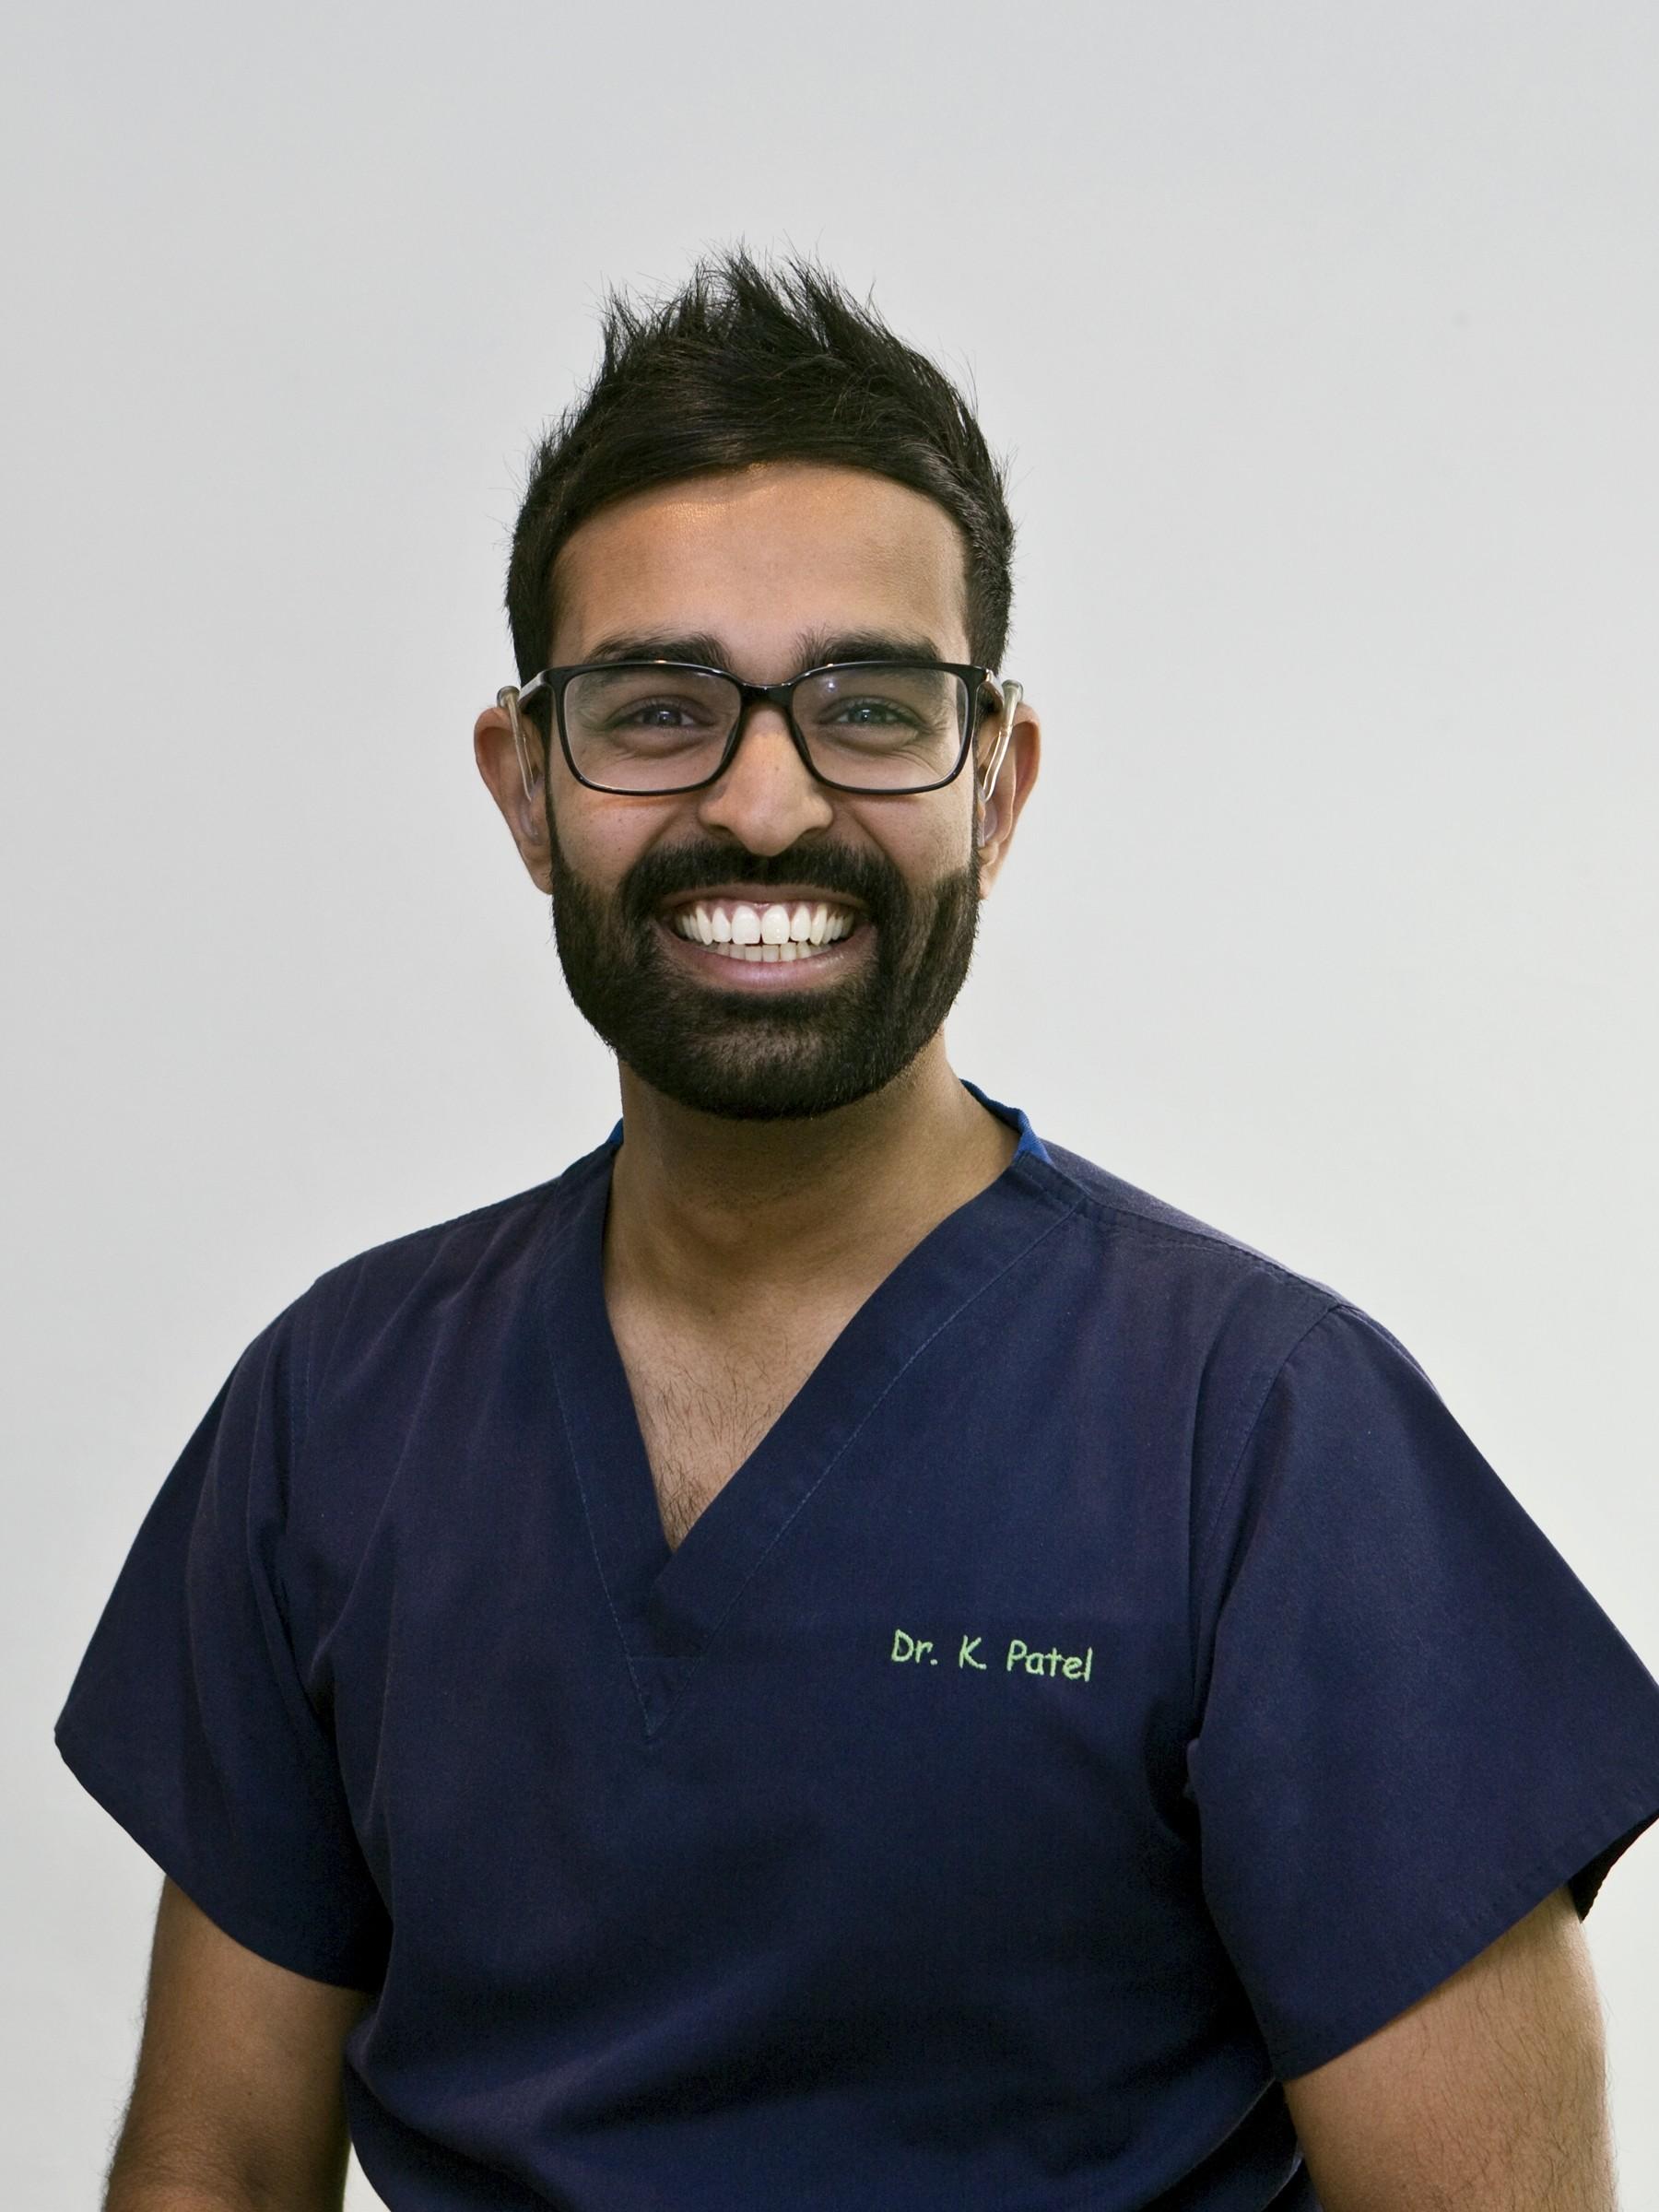 Kunal Patel the principle dentist at Etwall Dental practice